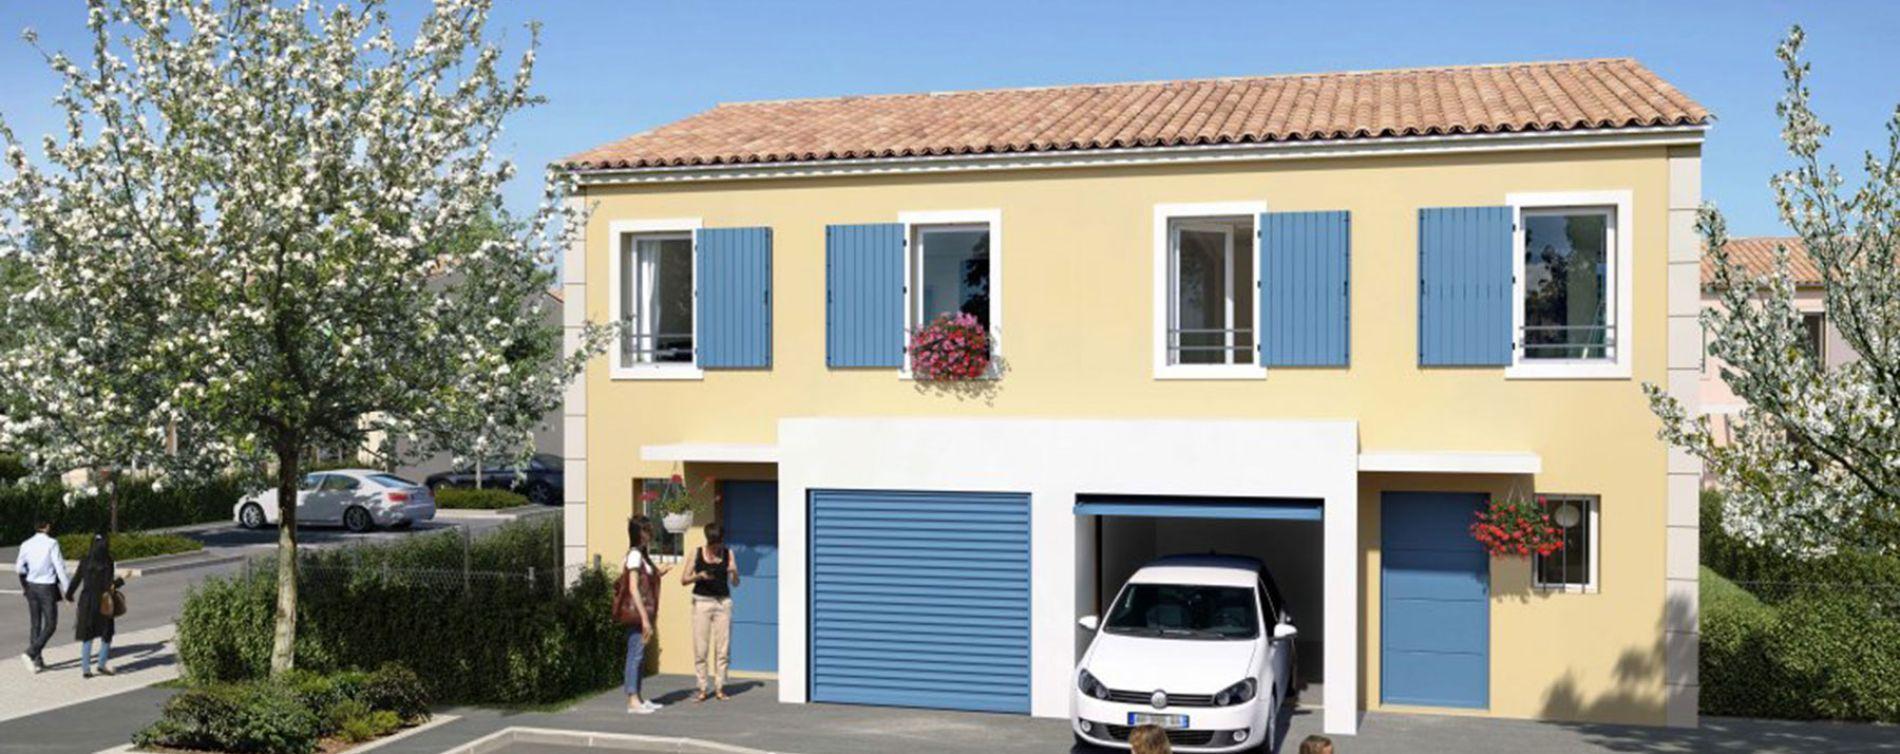 Pertuis : programme immobilier neuve « Luberance » (5)